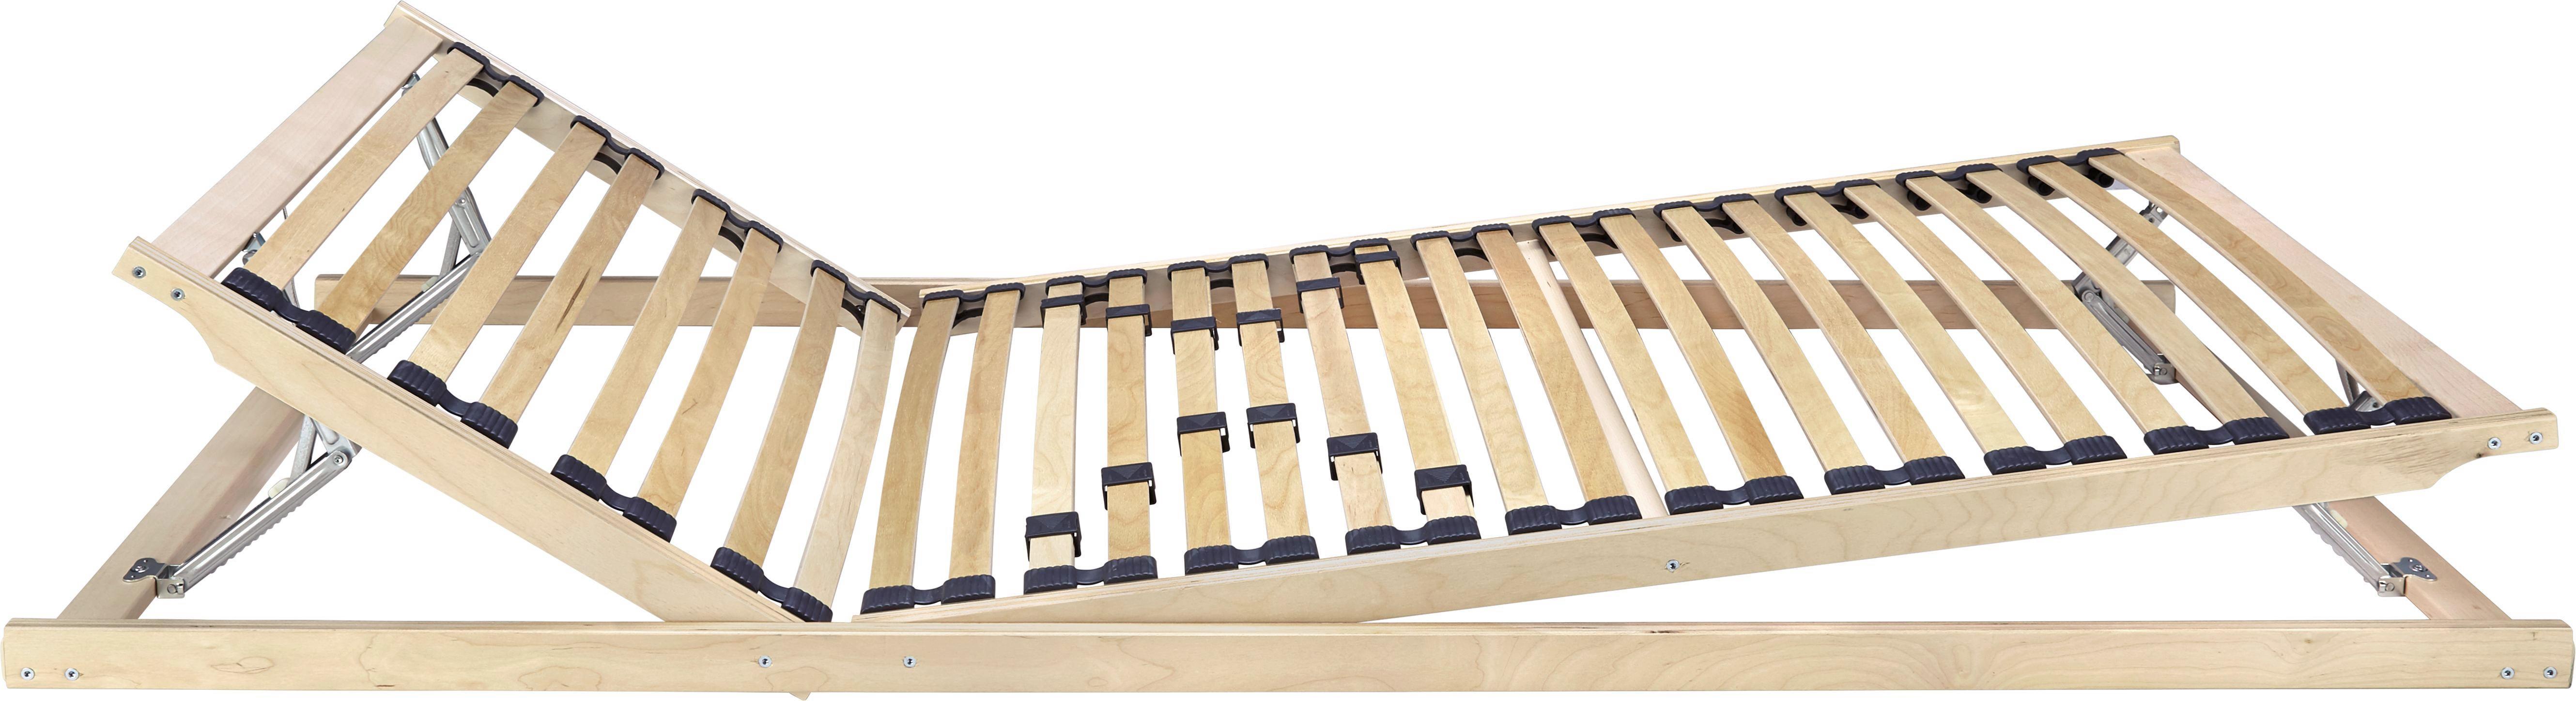 Lattenrost verstellbar, ca. 80x200cm - (80/200cm) - NADANA